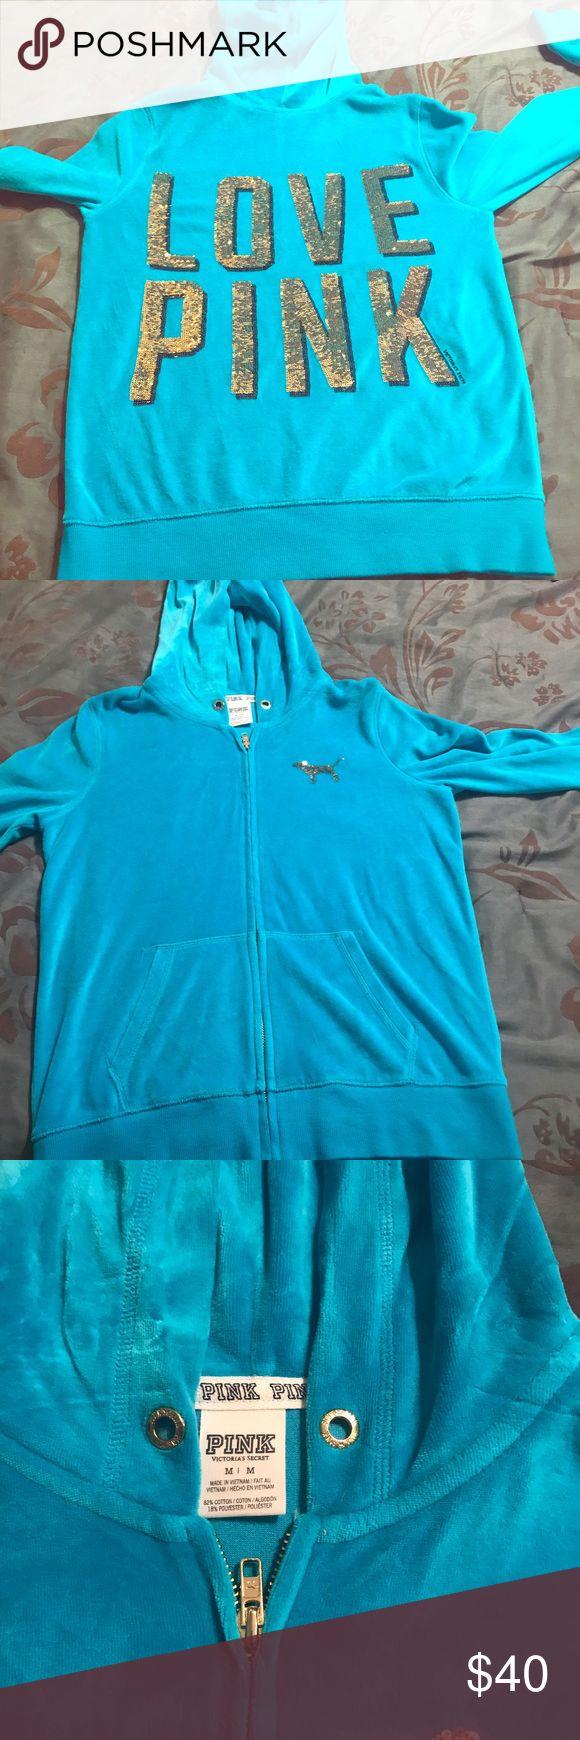 🌟🌟🌟Bling VS Pink Hoodie🌟🌟🌟 Turquoise VS Pink hoodie size M worn once. Great condition PINK Victoria's Secret Tops Sweatshirts & Hoodies